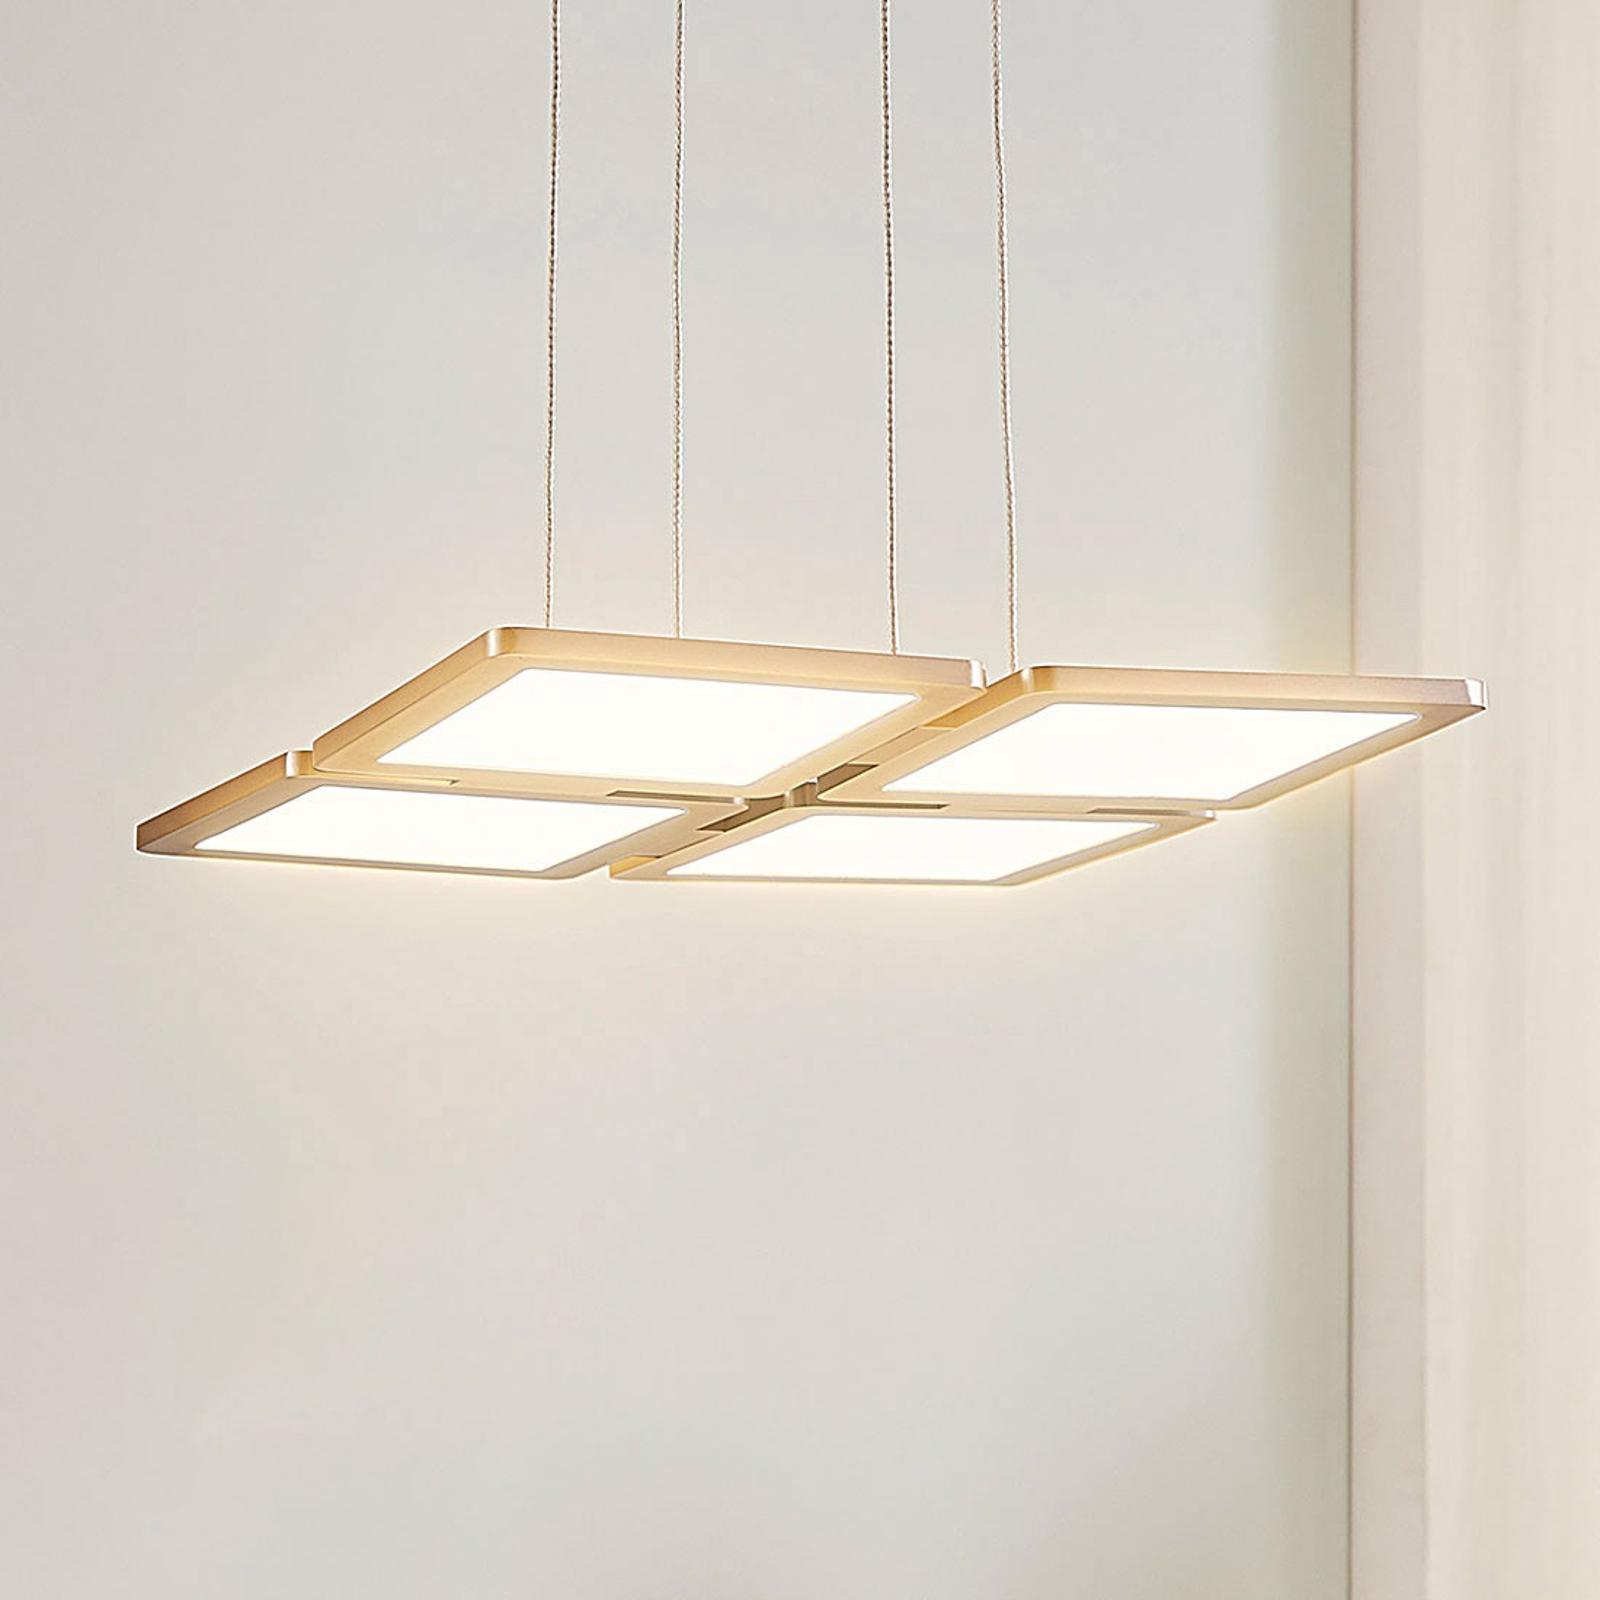 Dimmbare LED-Pendelleuchte Elian